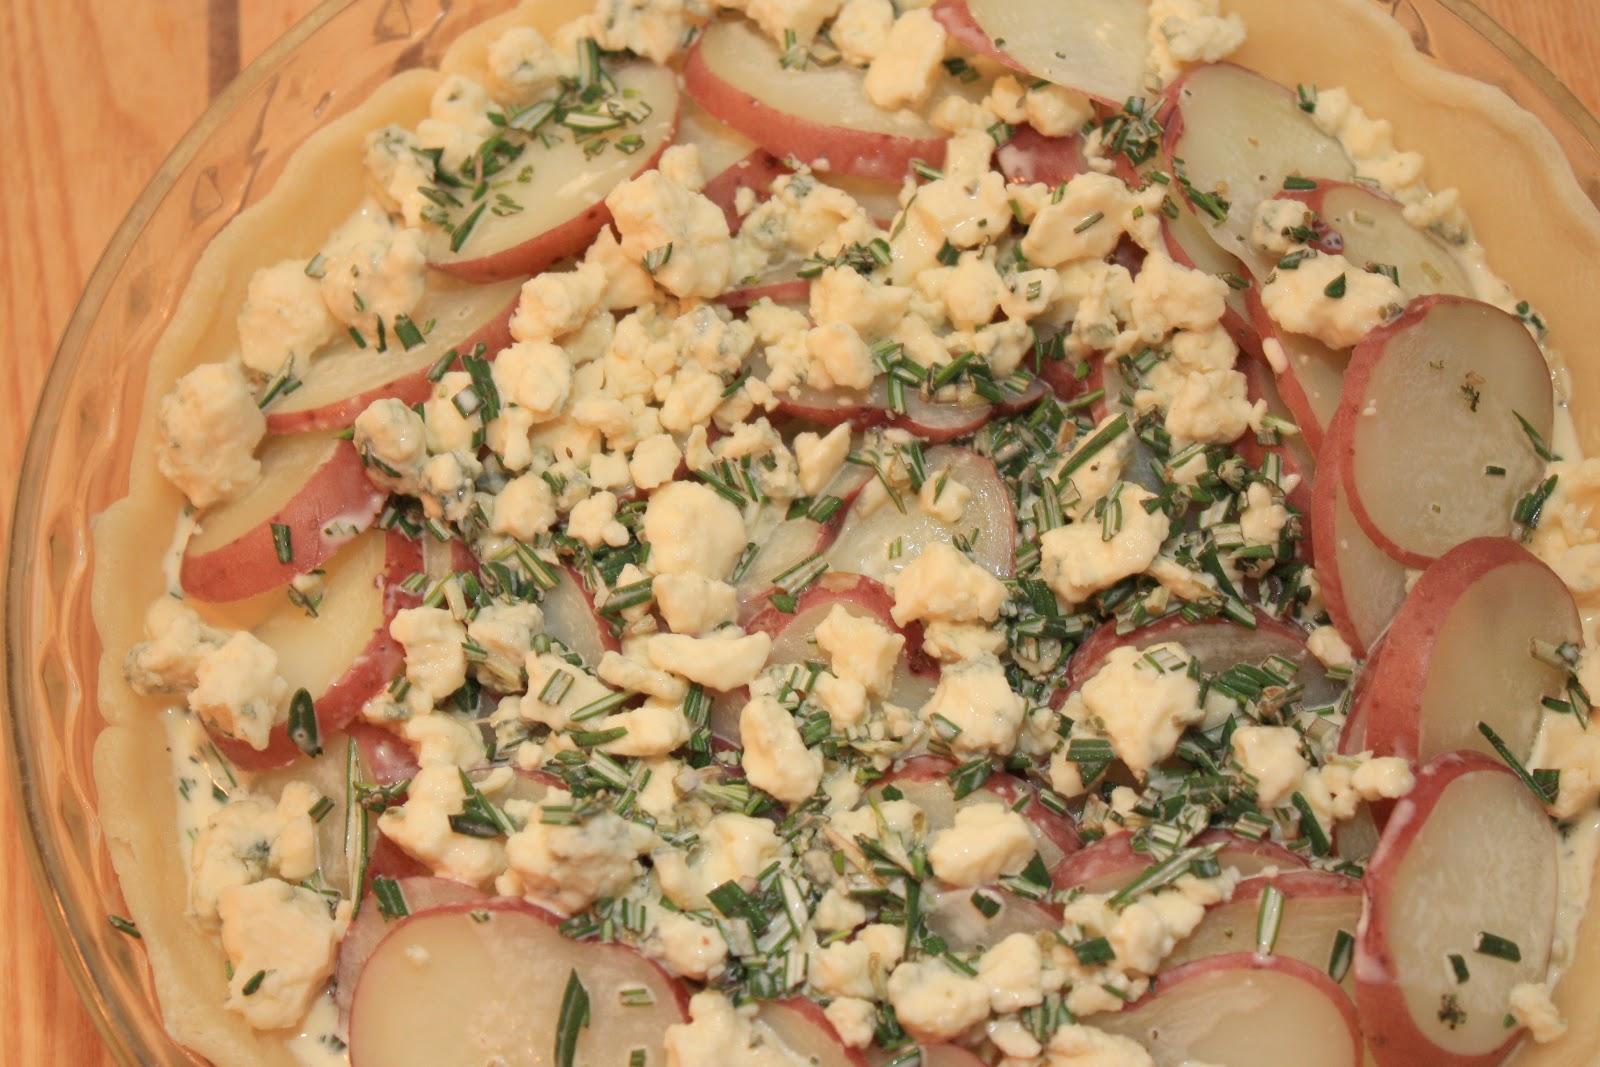 The Bitchin' Kitchin': Blue Cheese and Red Potatoes Tart